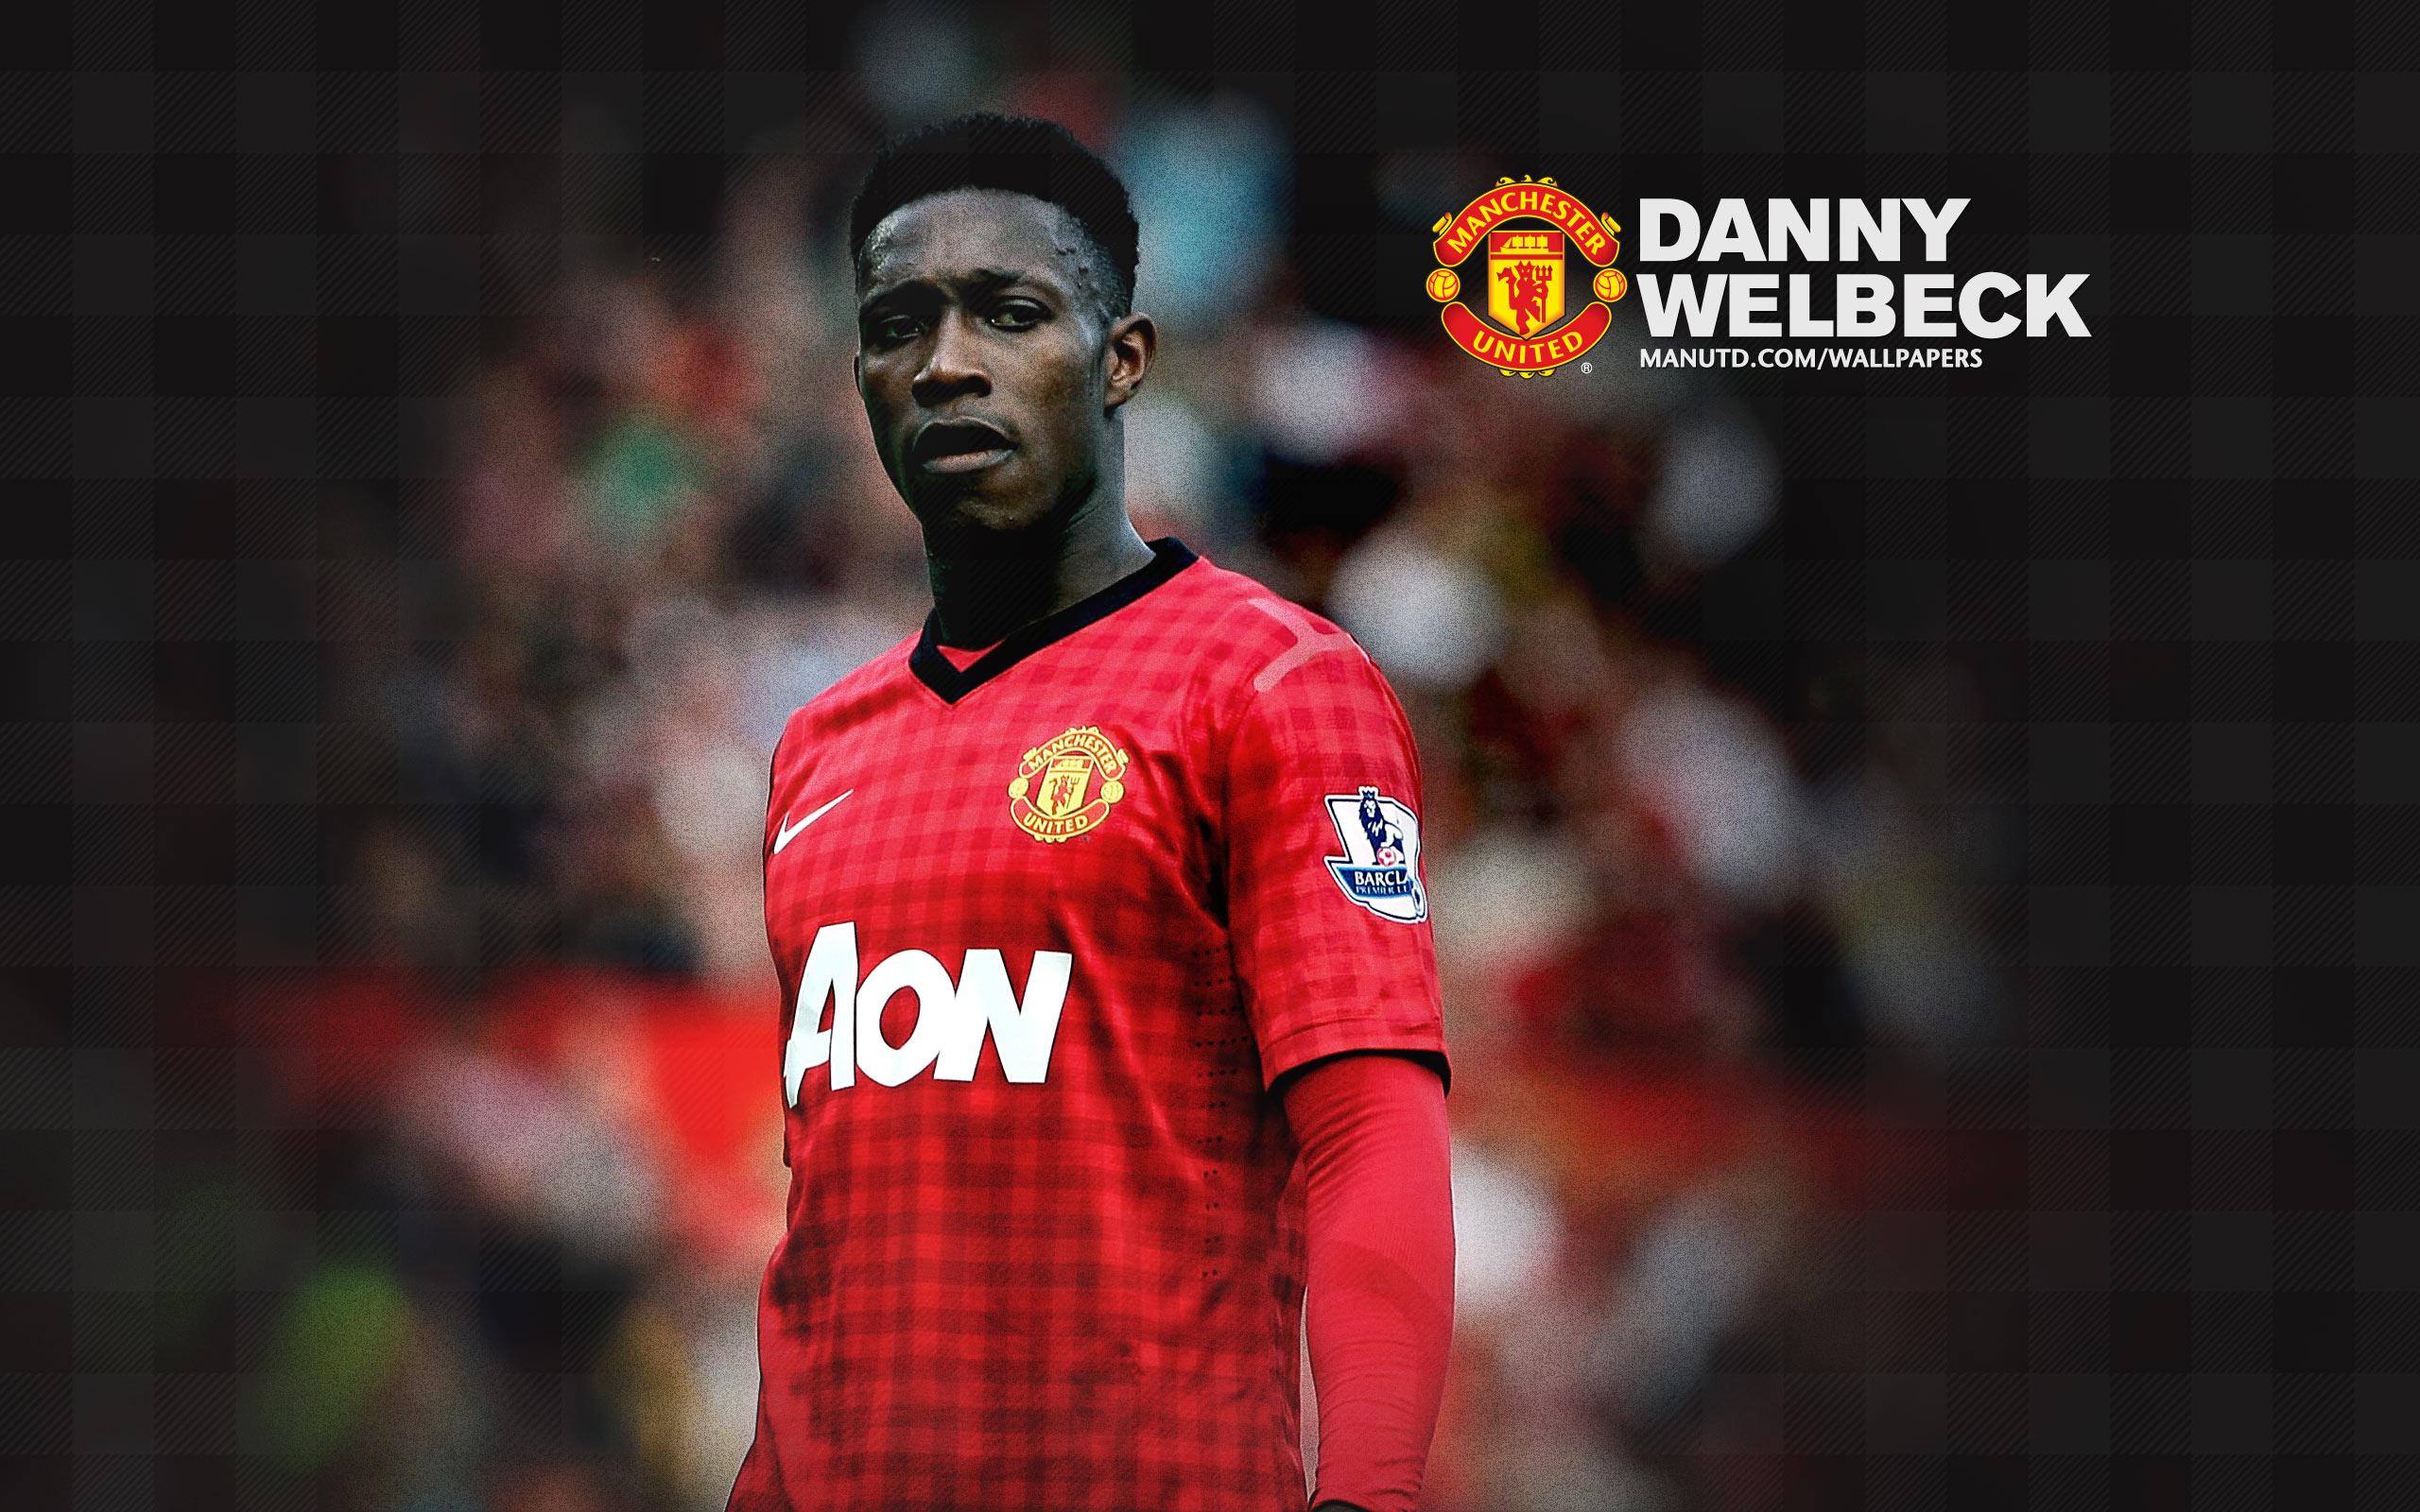 Man U Picture: Manchester United Wallpaper